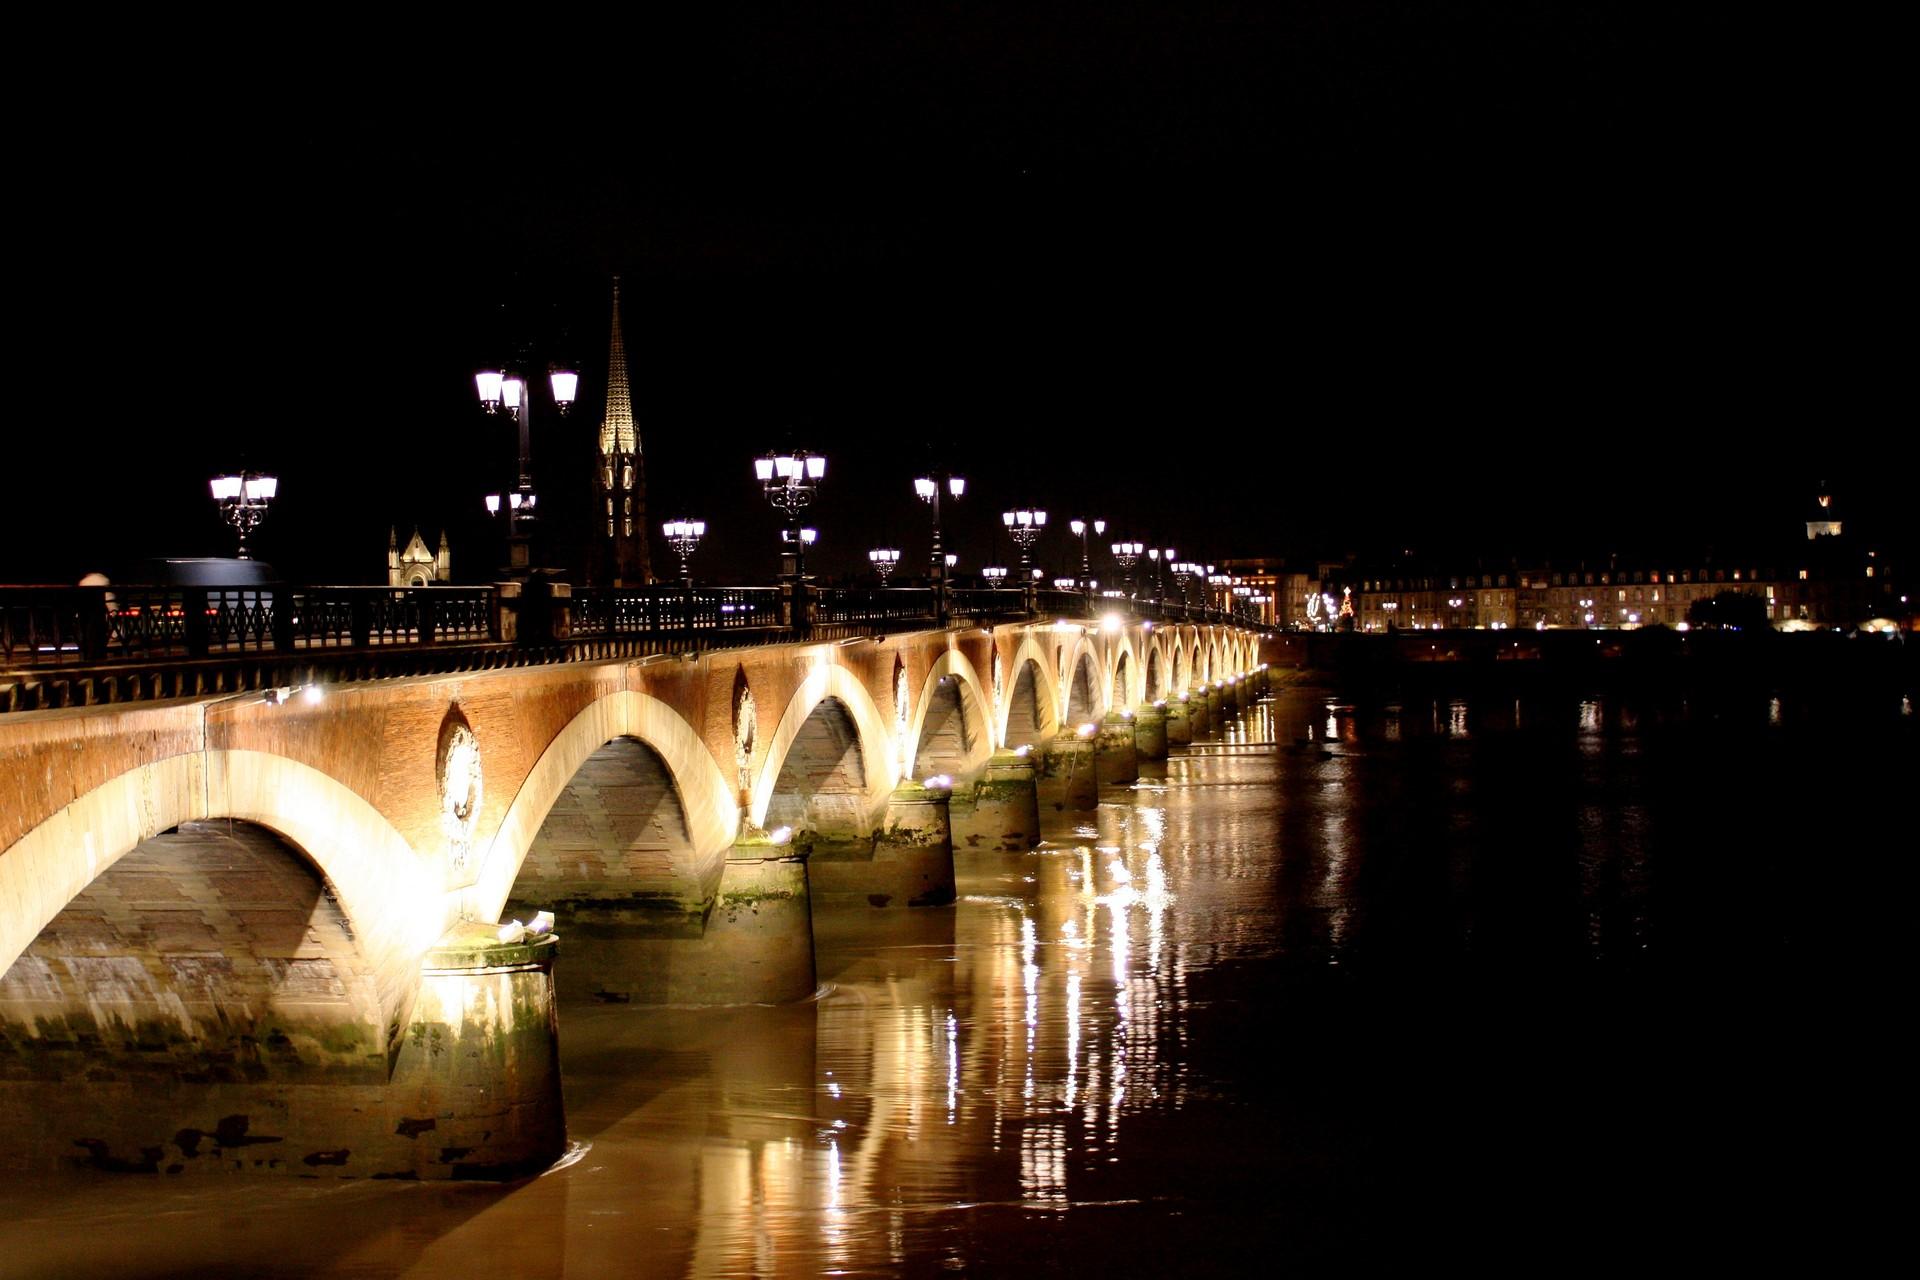 Esperienza a Bordeaux, Francia di Ary